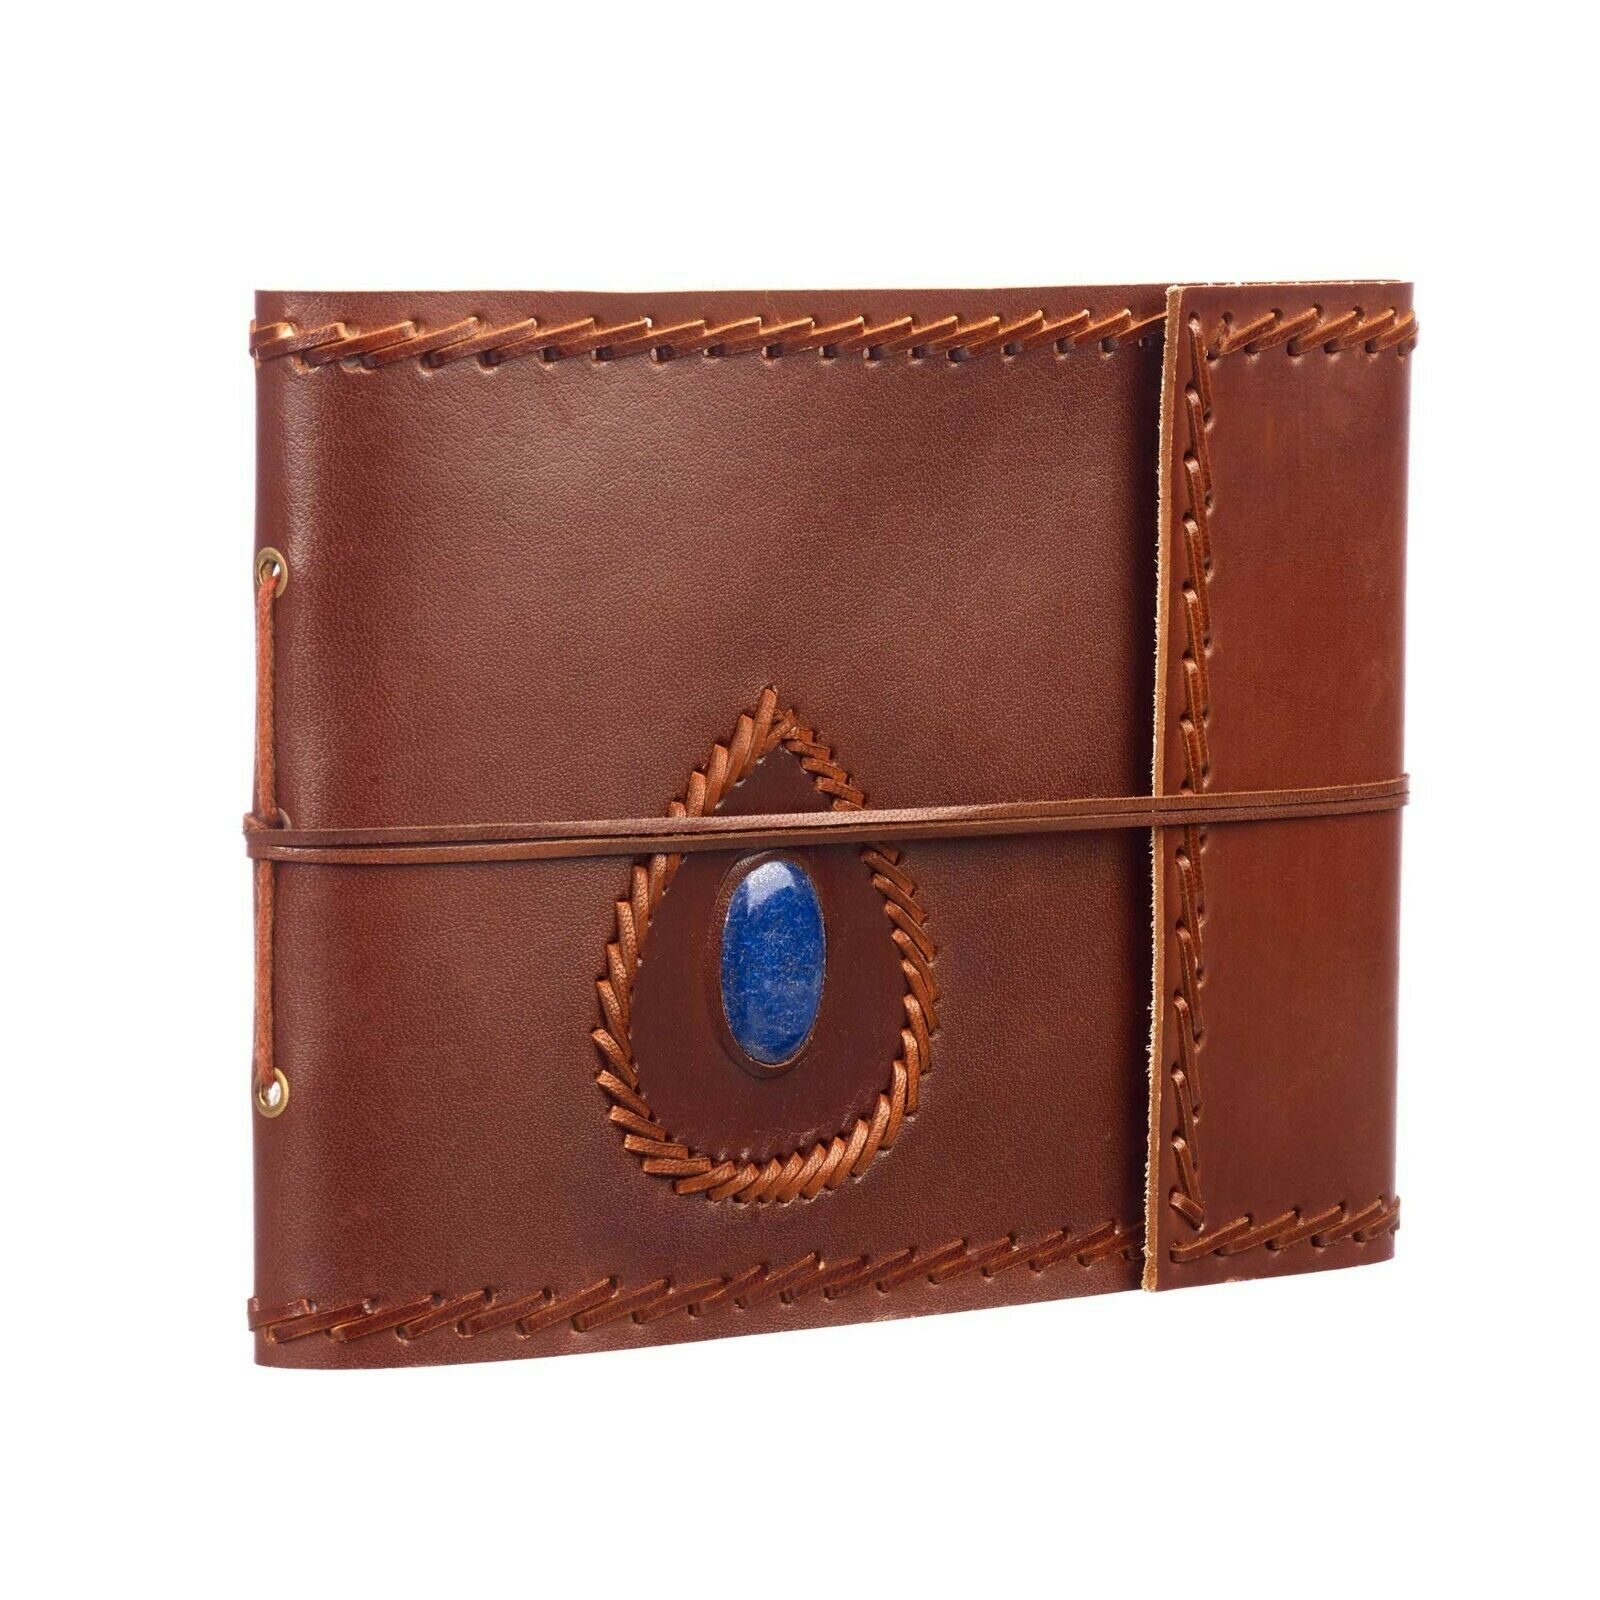 Semi-Precious Stone Leather Photo Album Scrapbook, Fits 120 6x4